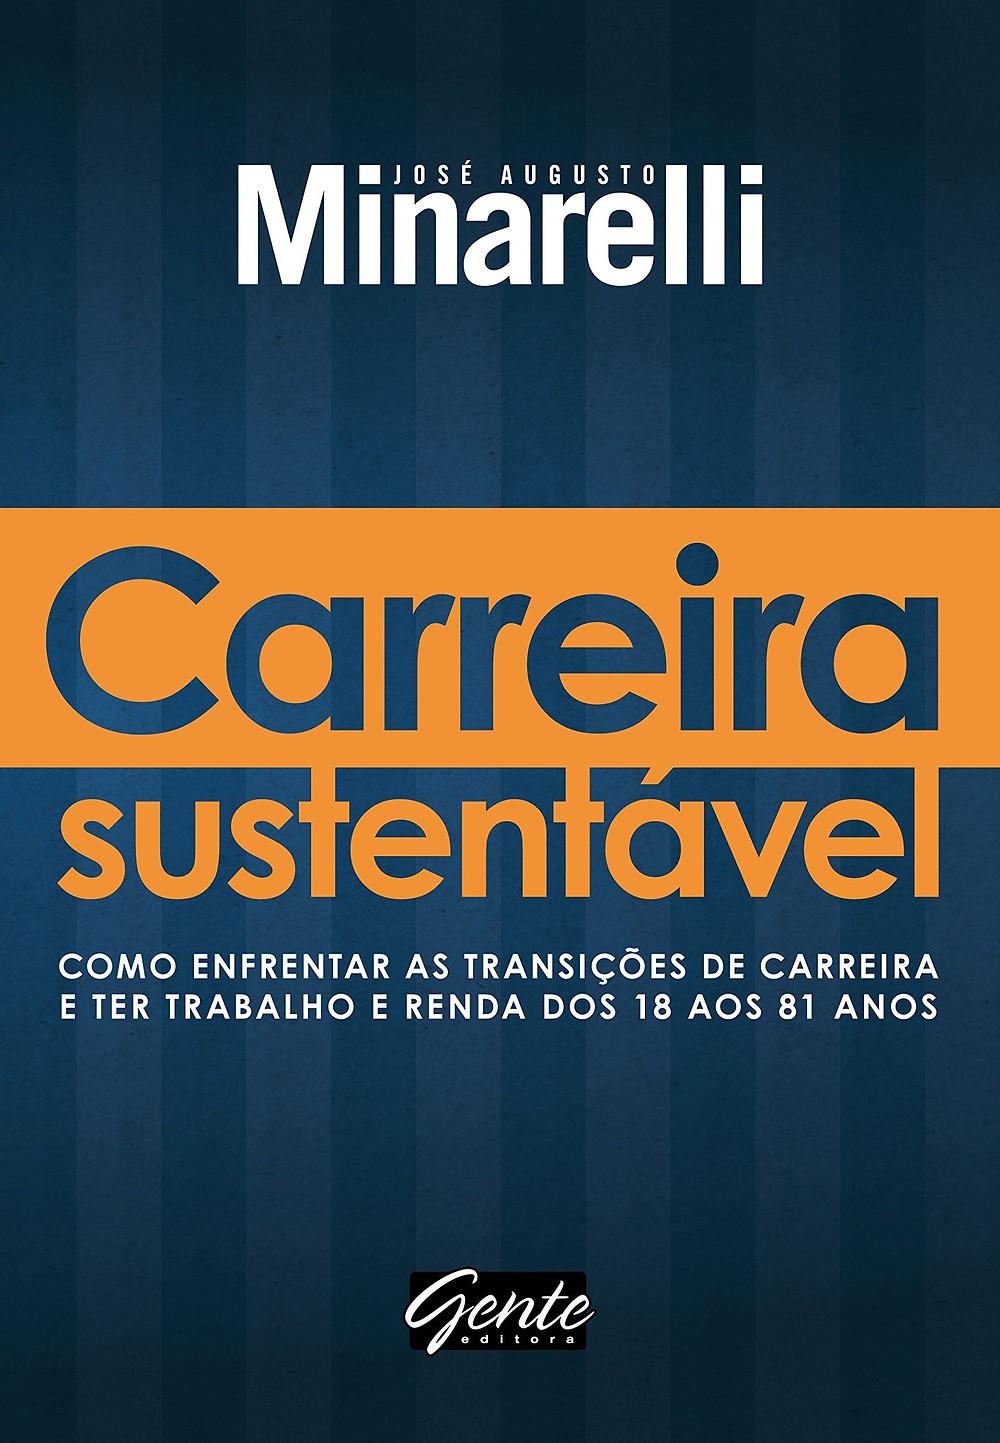 Carreira Sustentável de José Augusto Minarelli